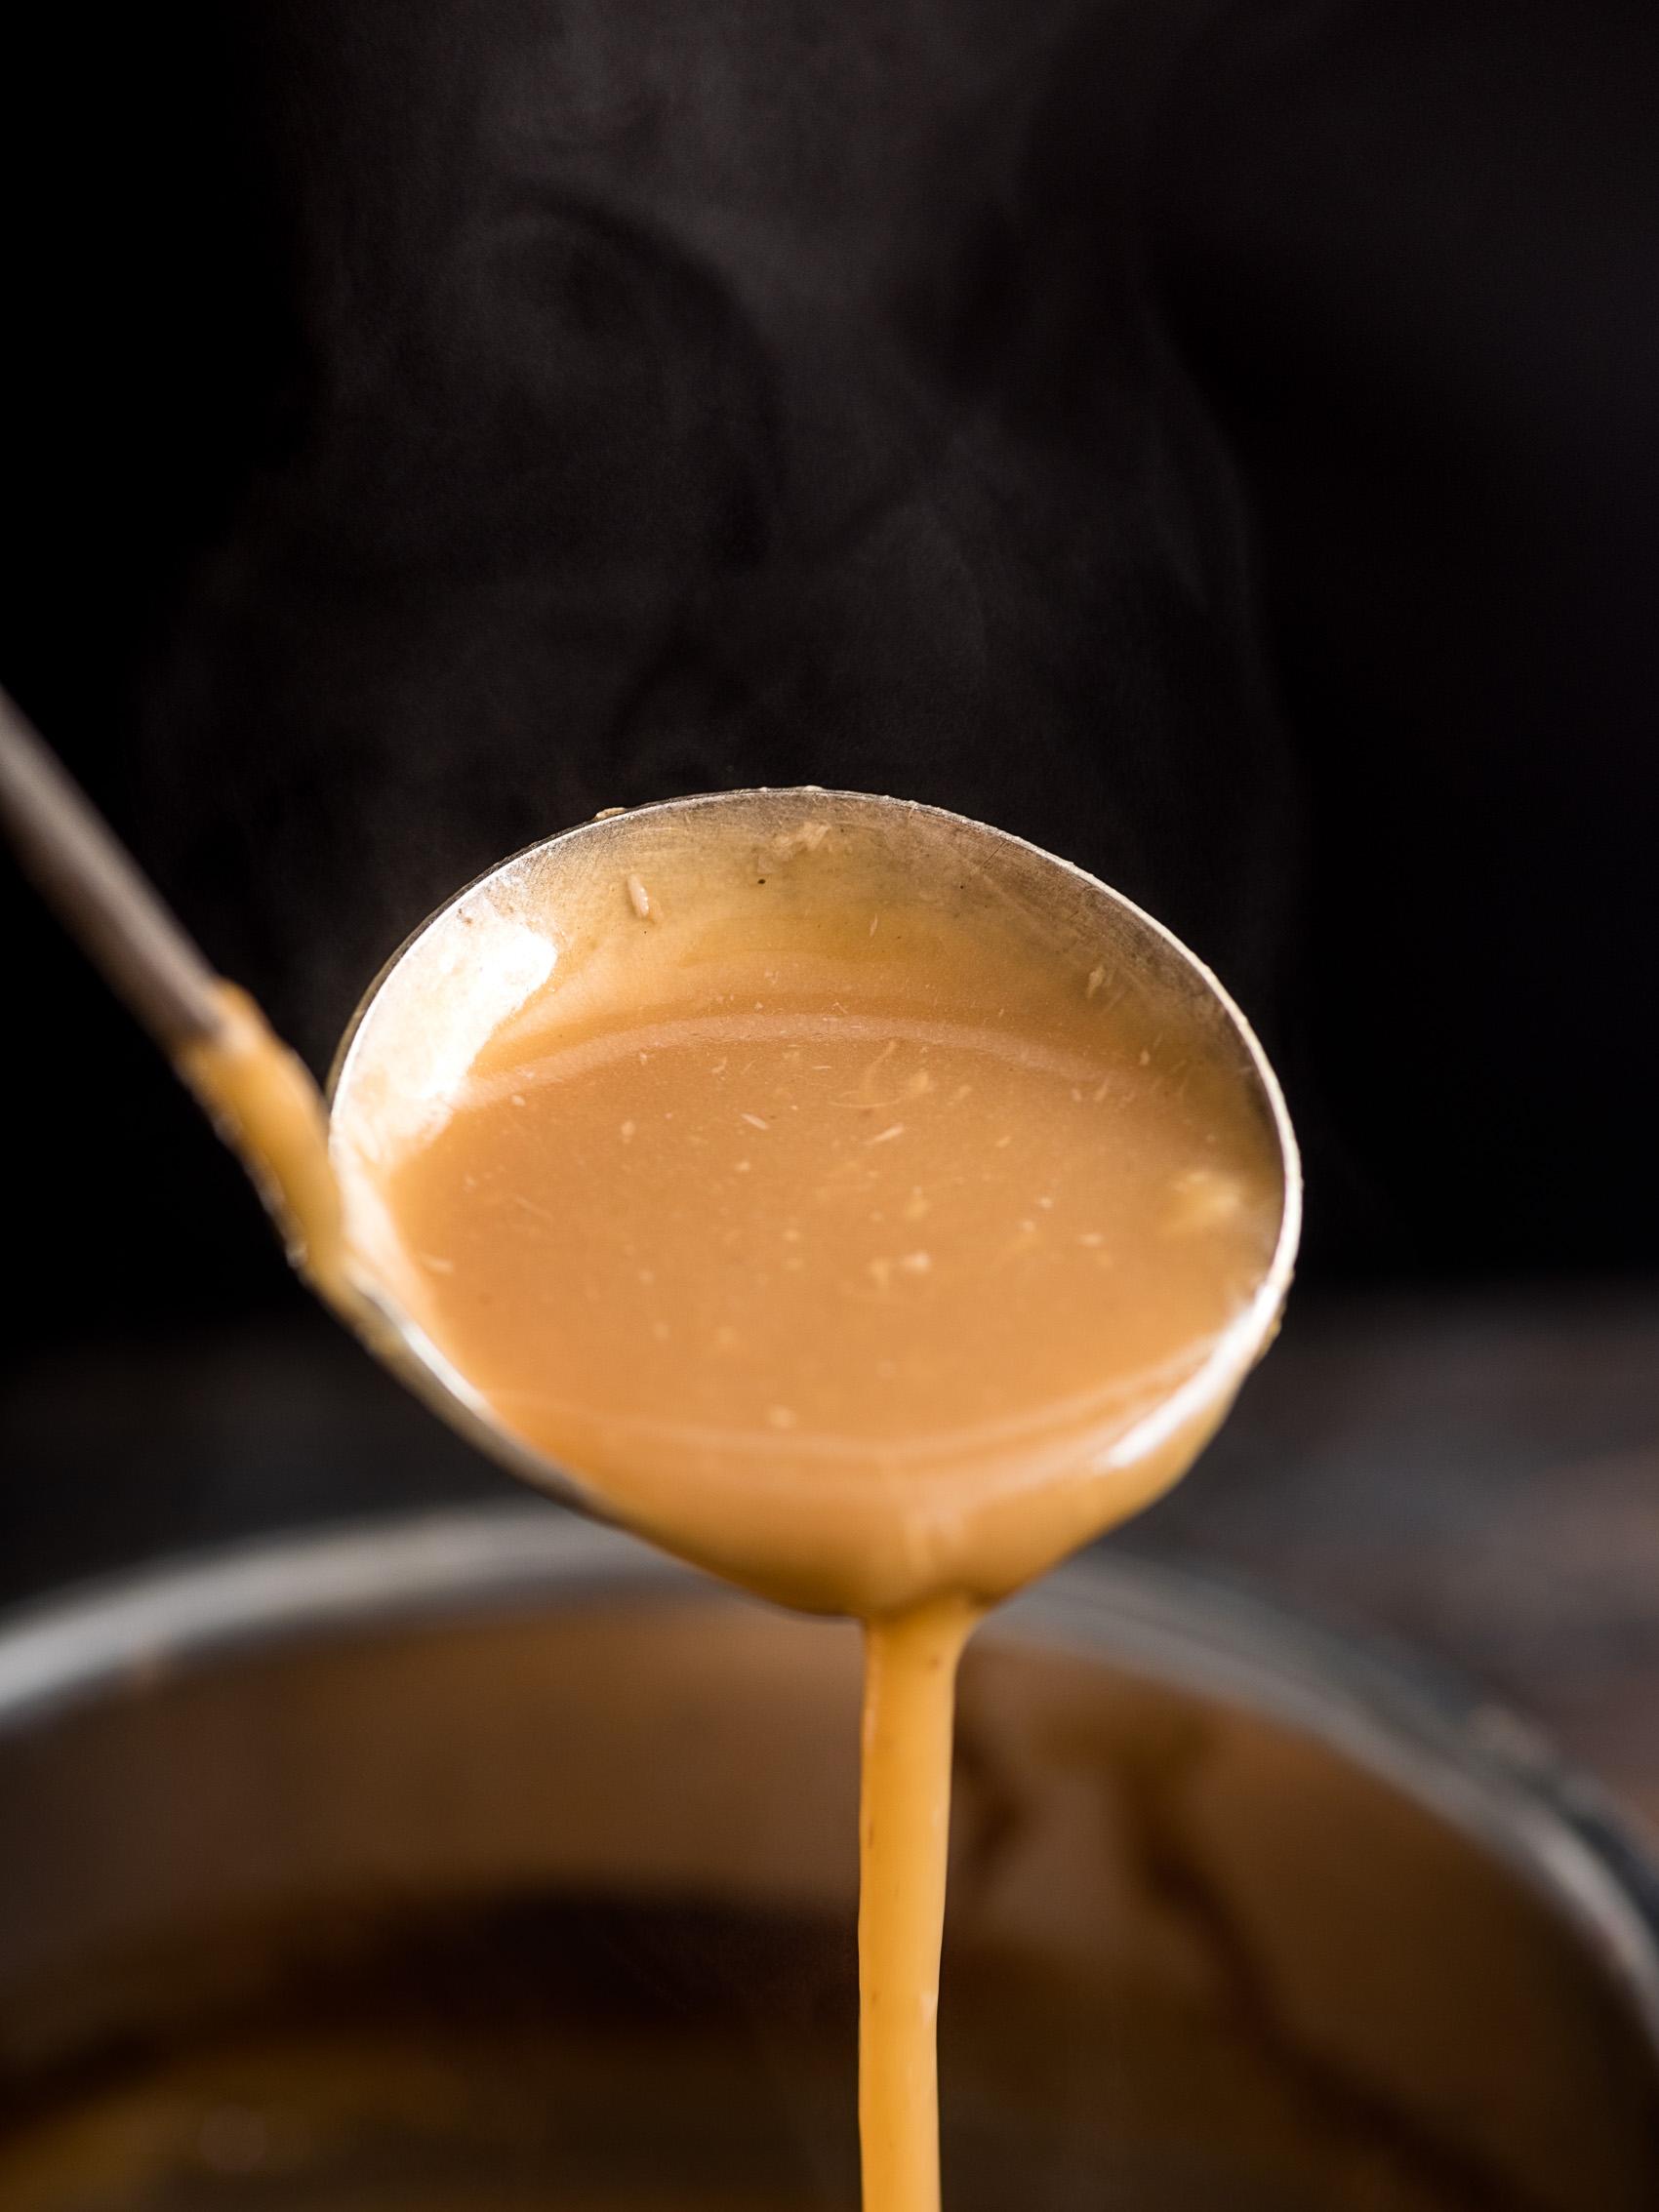 Roasted-garlic-gravy